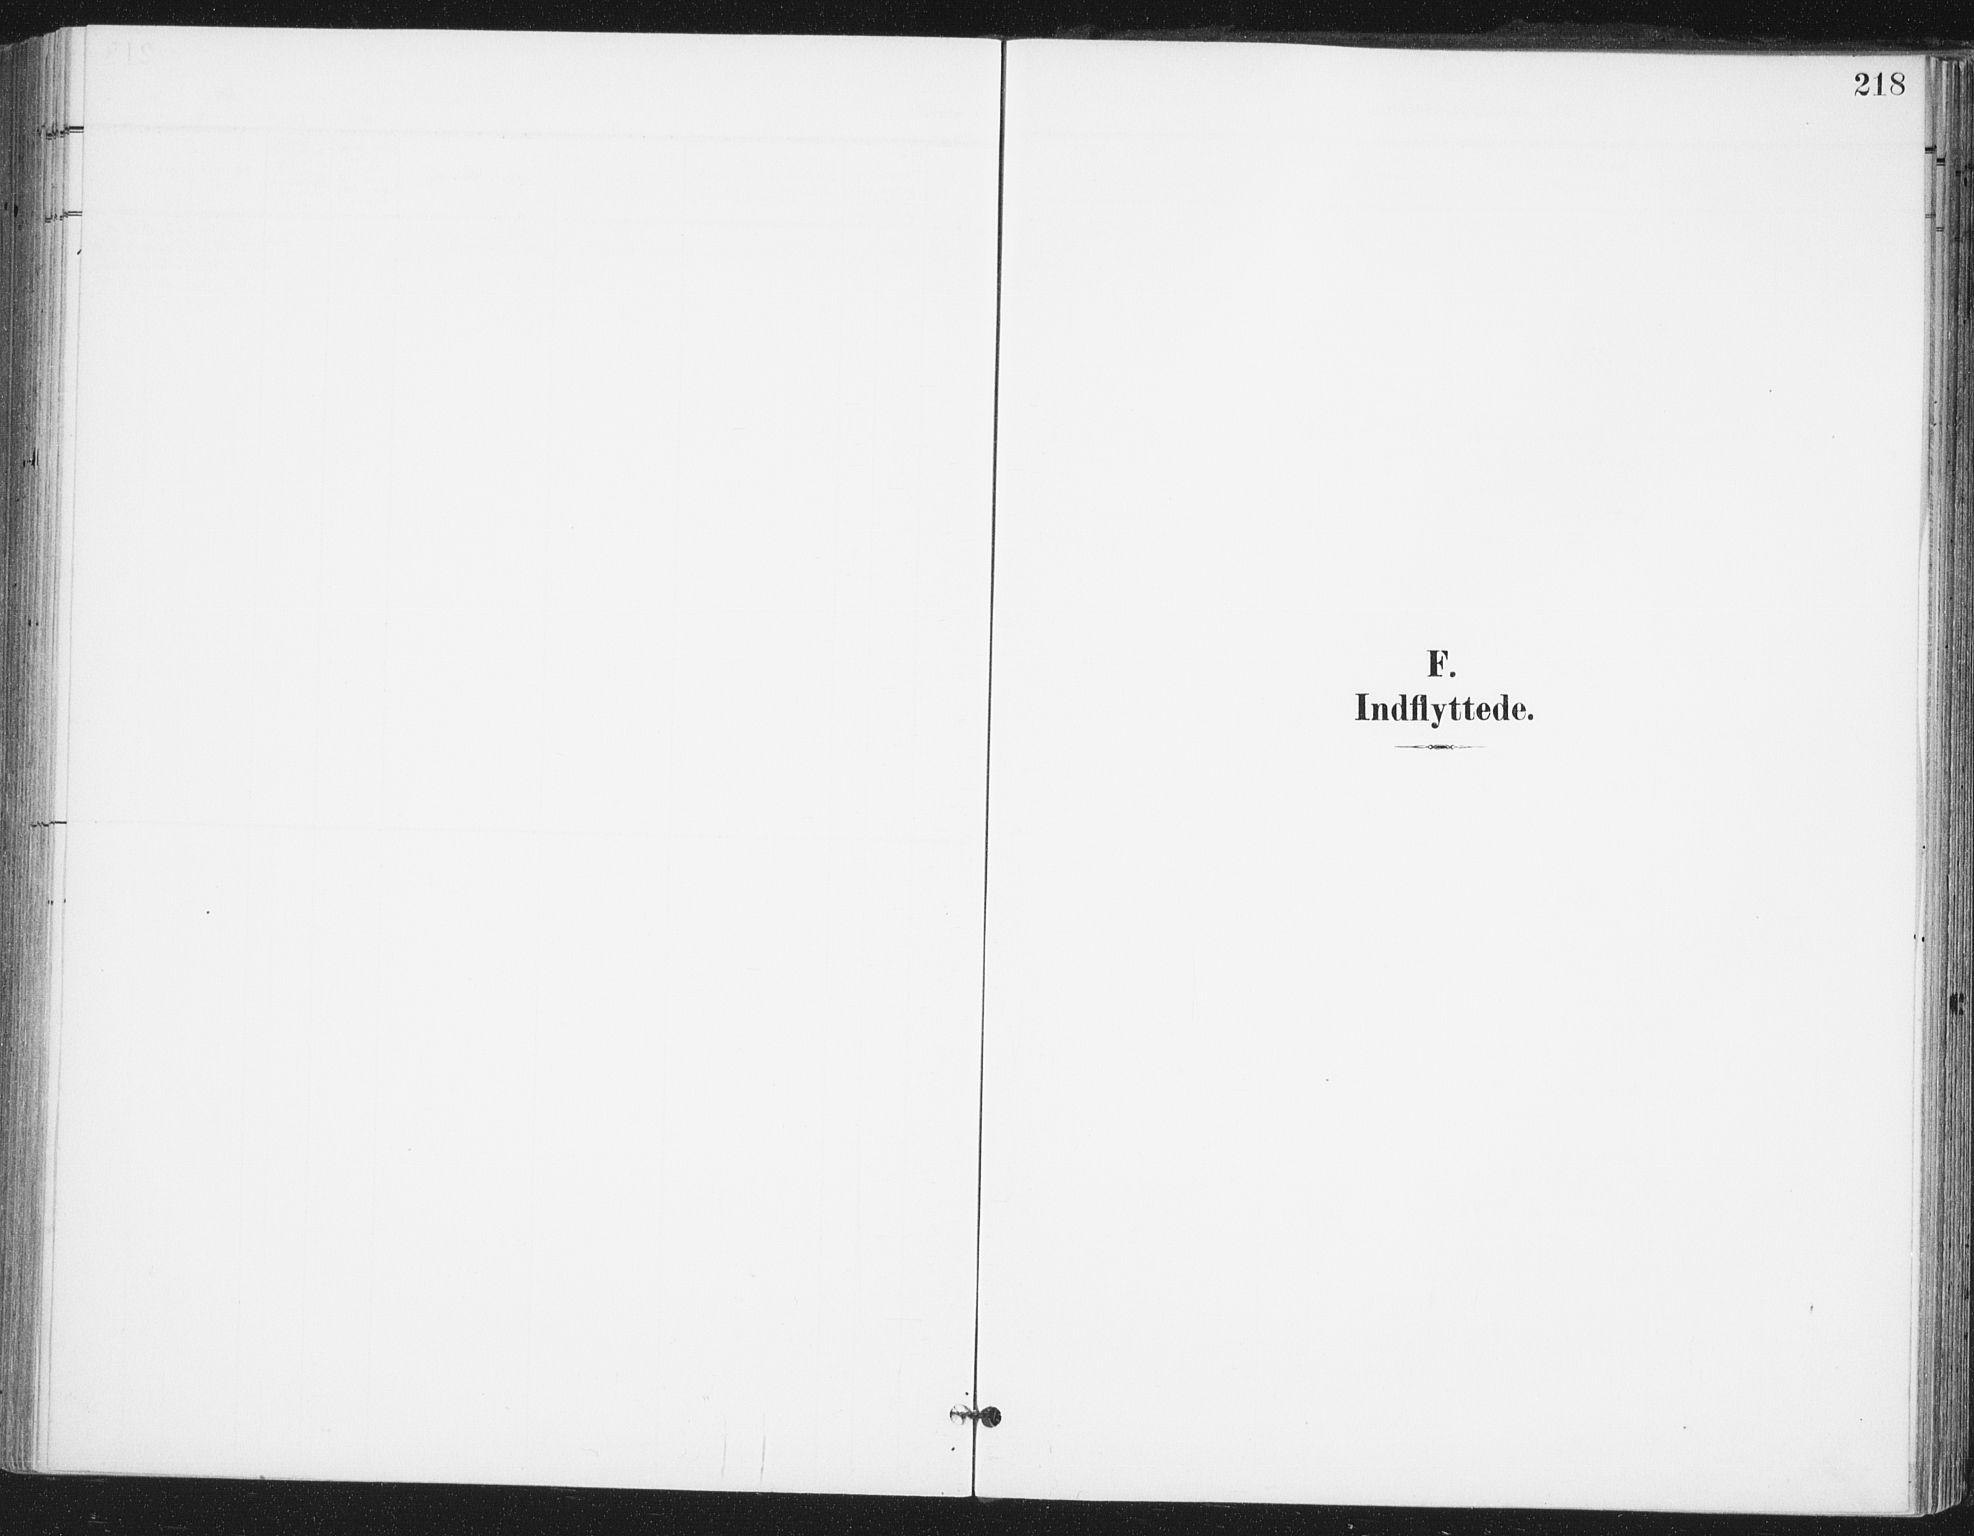 SAO, Ås prestekontor Kirkebøker, F/Fa/L0010: Ministerialbok nr. I 10, 1900-1918, s. 218